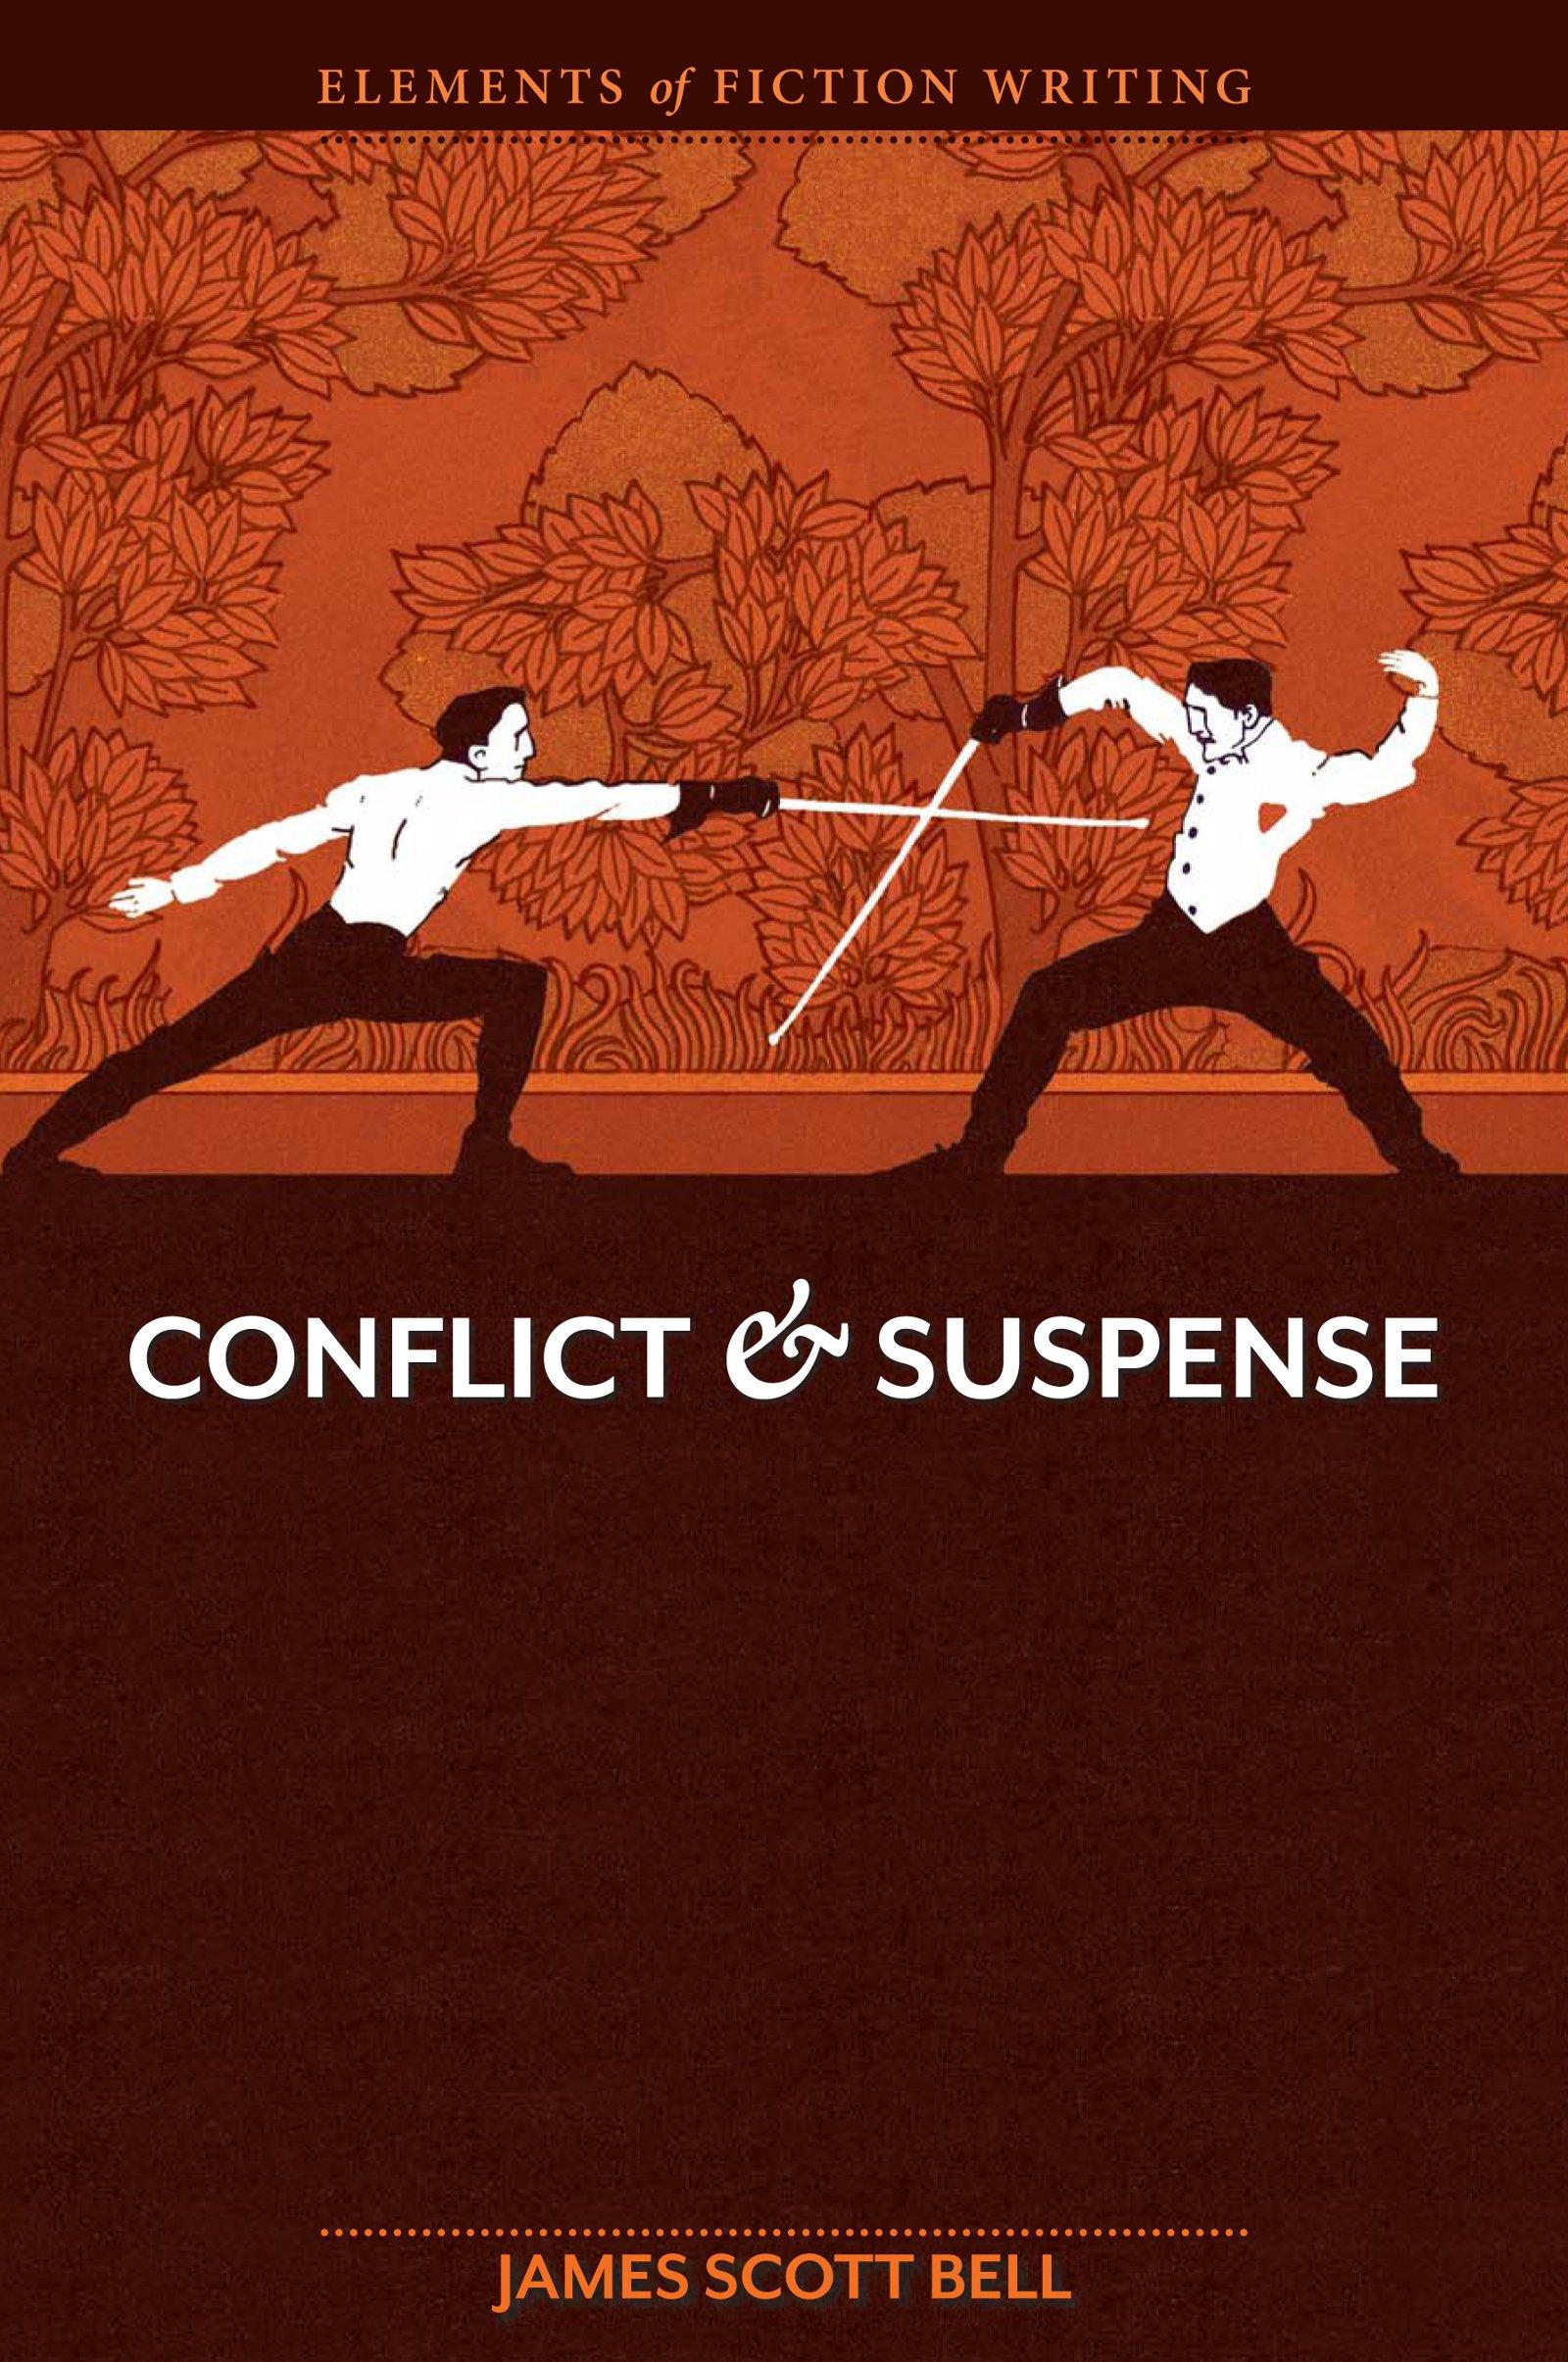 elements of suspense